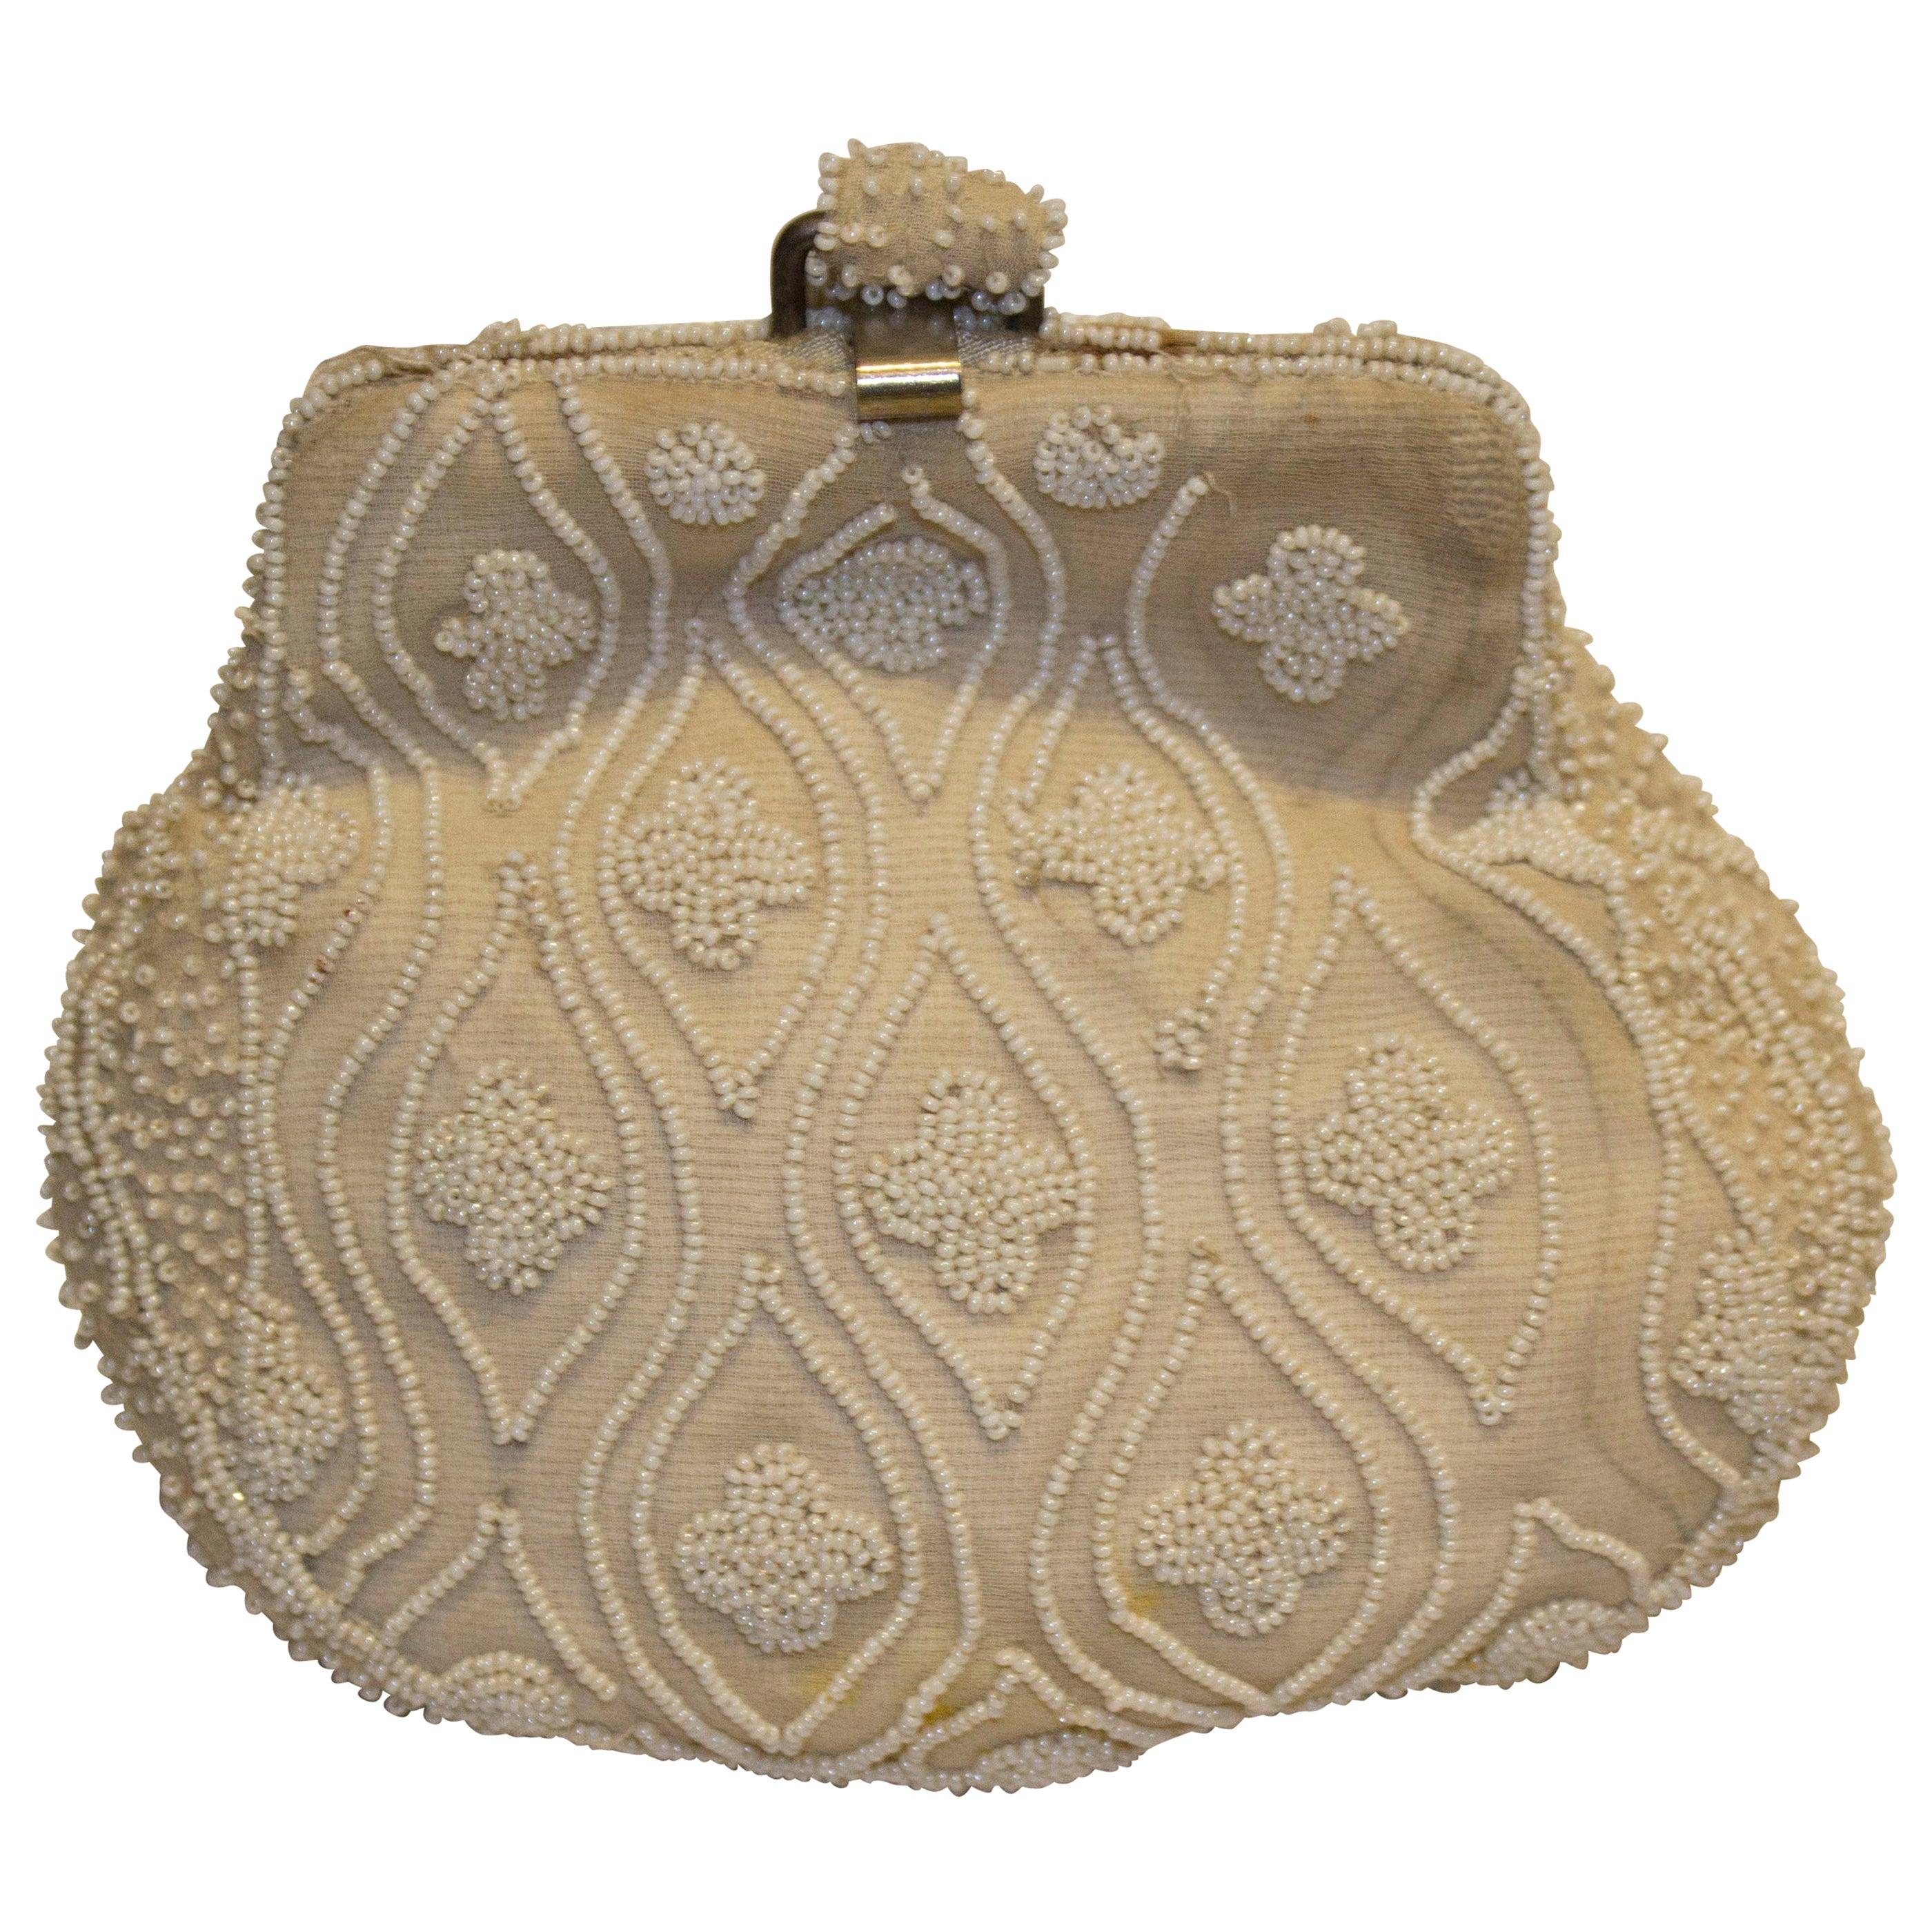 Vintage Silver Metallic Mesh Bags Light Green Draw String French